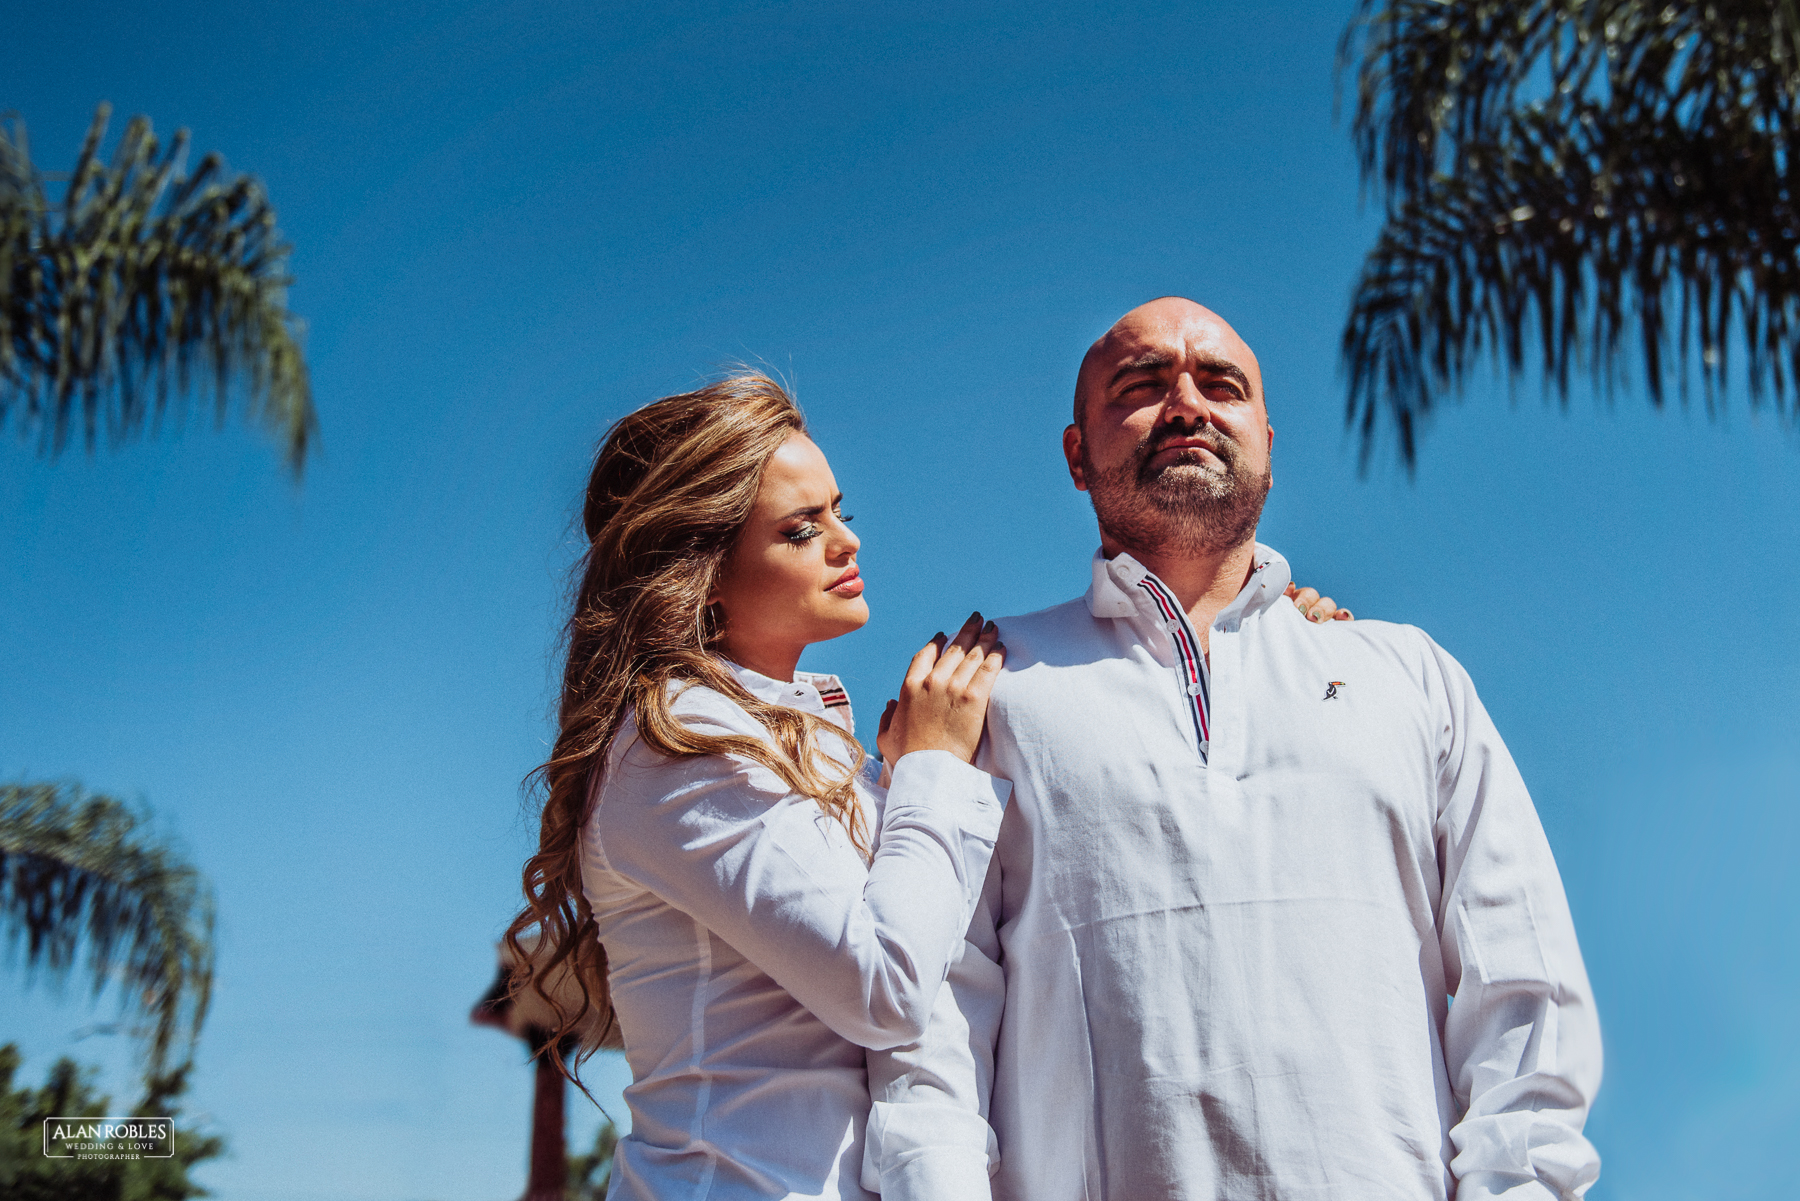 PreBoda KyA Guadalajara-Fotografo de bodas Alan Robles-8